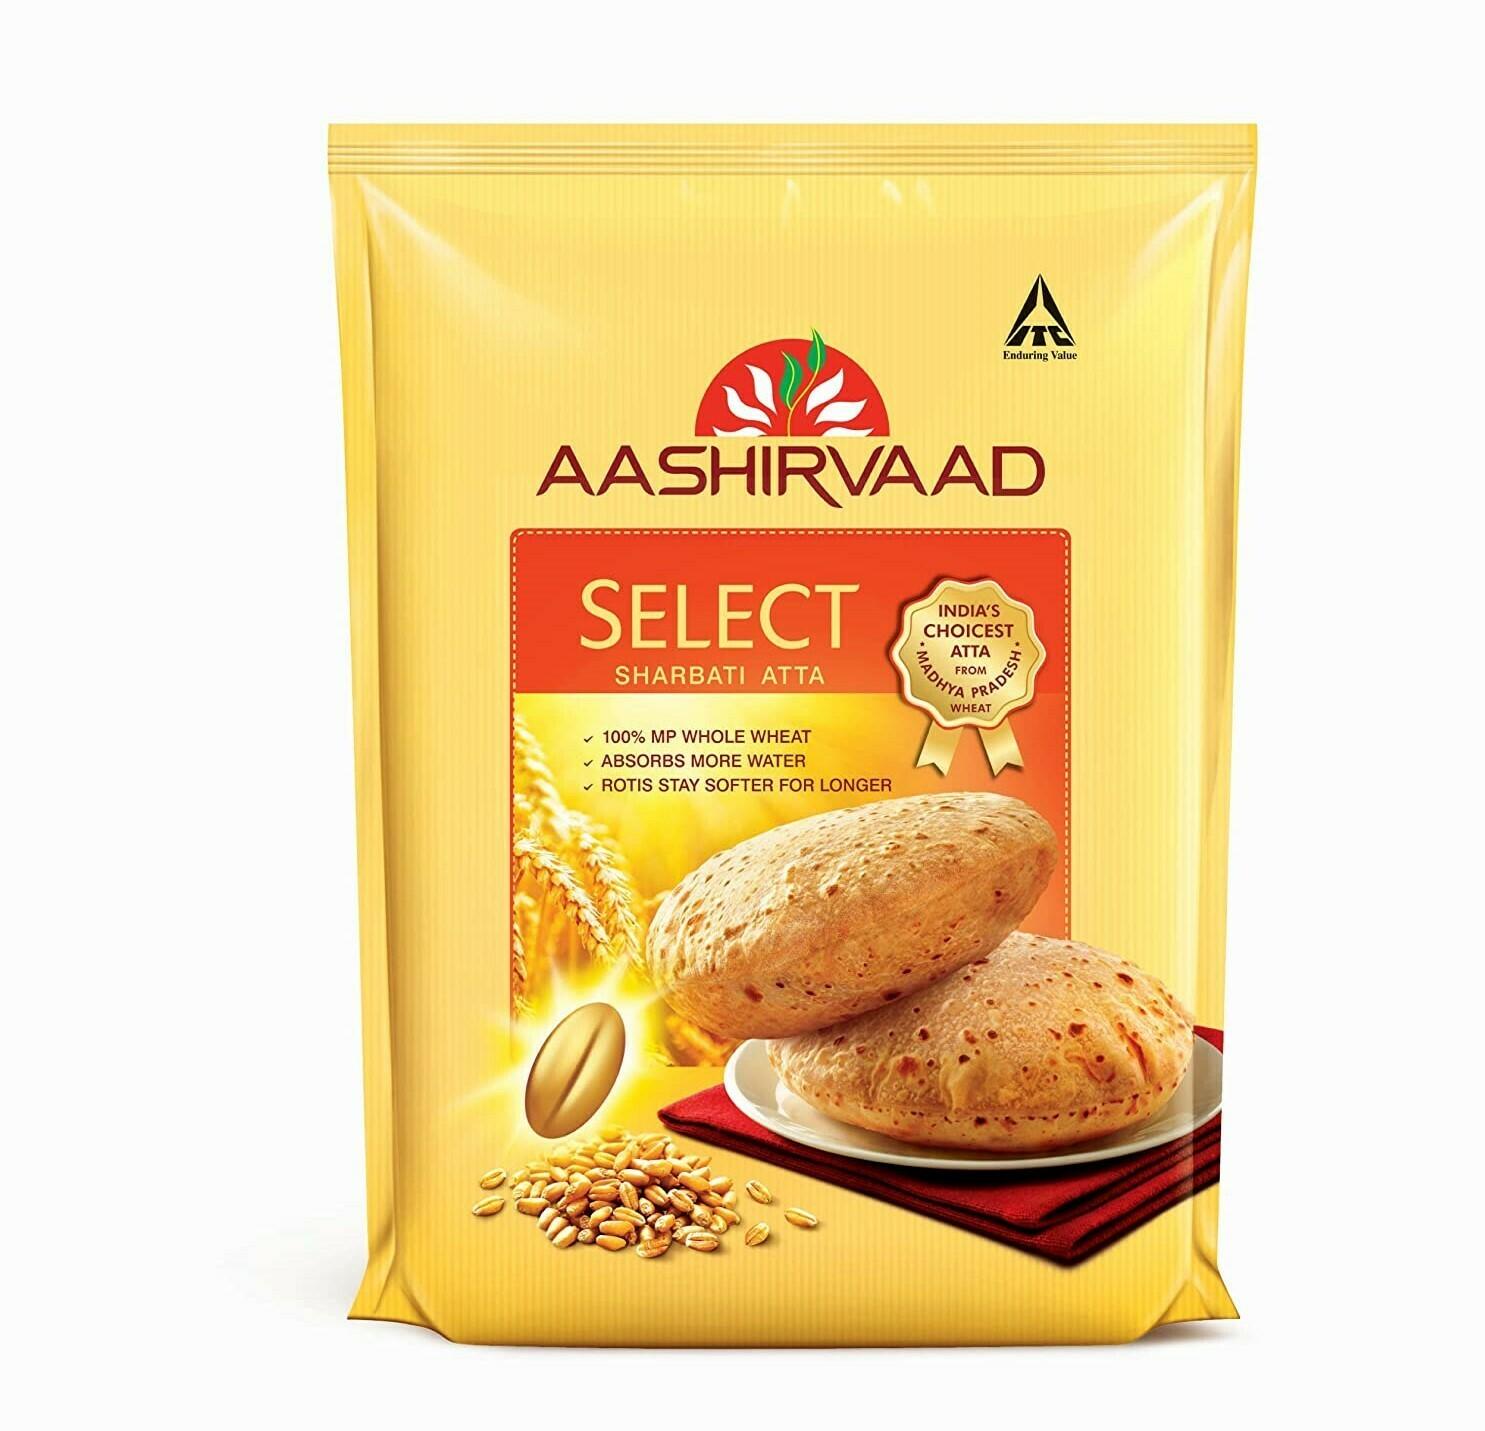 Aashirvaad Select Sharbati Atta 10lb